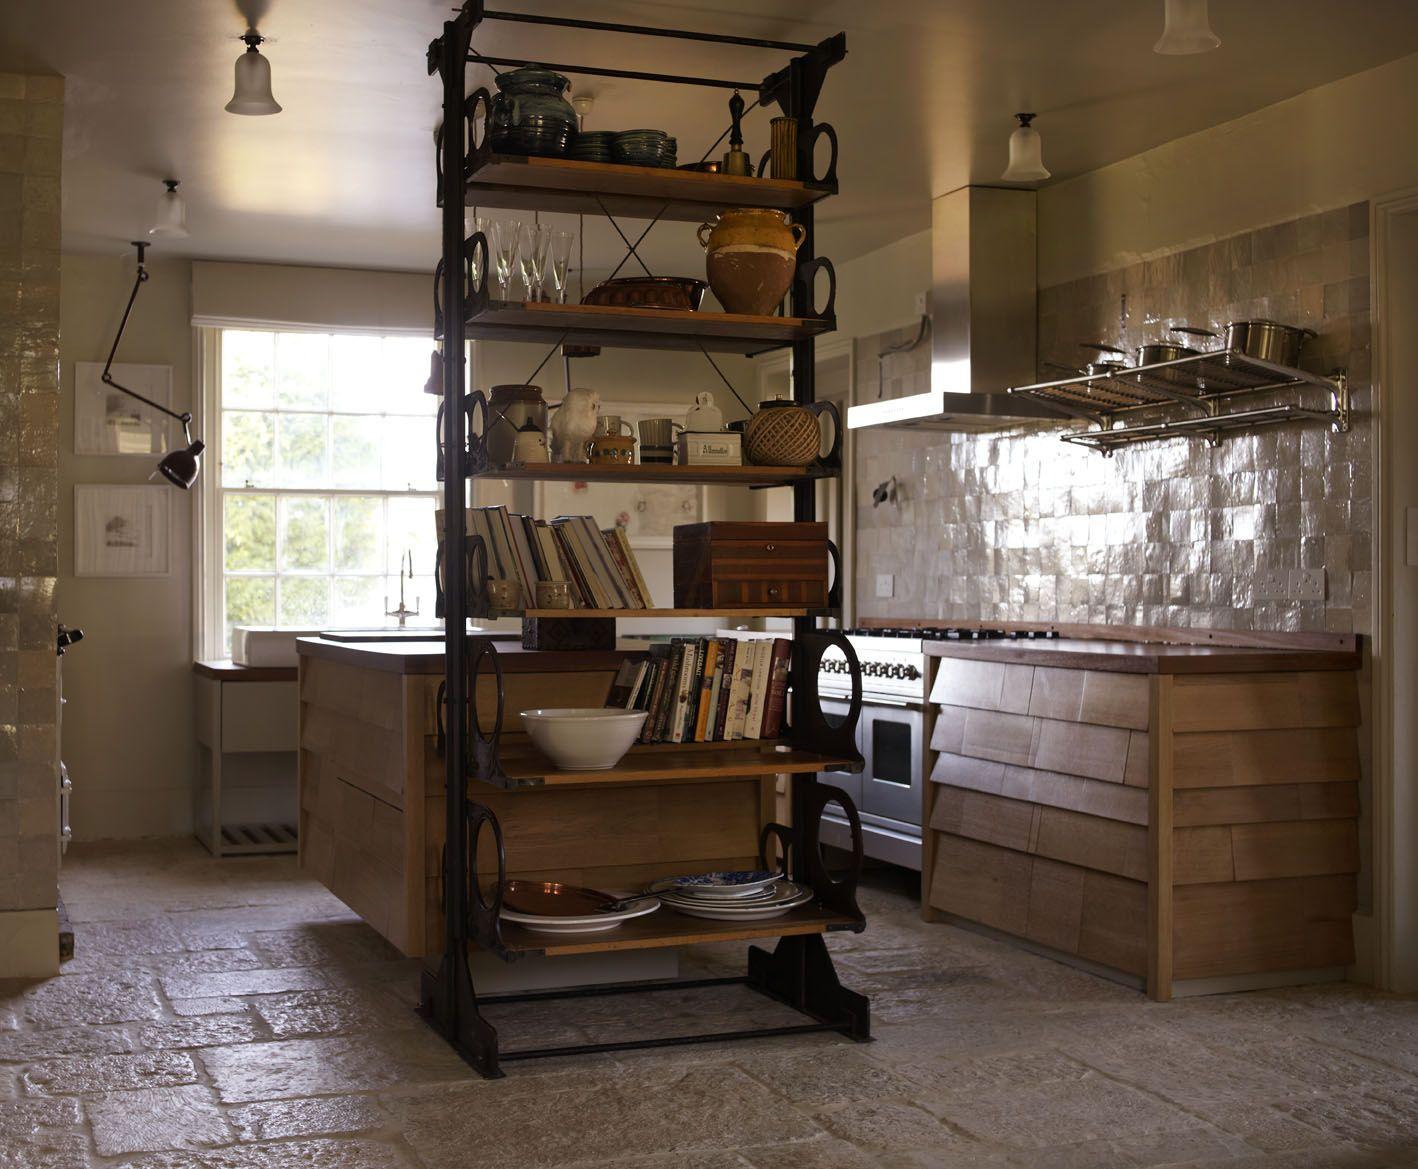 unfitted kitchen design. Unique Kitchen Storage Design With Bookshelving Ideas Pin By Ann Martina On Unfitted Kitchen Ideas  Pinterest Wall